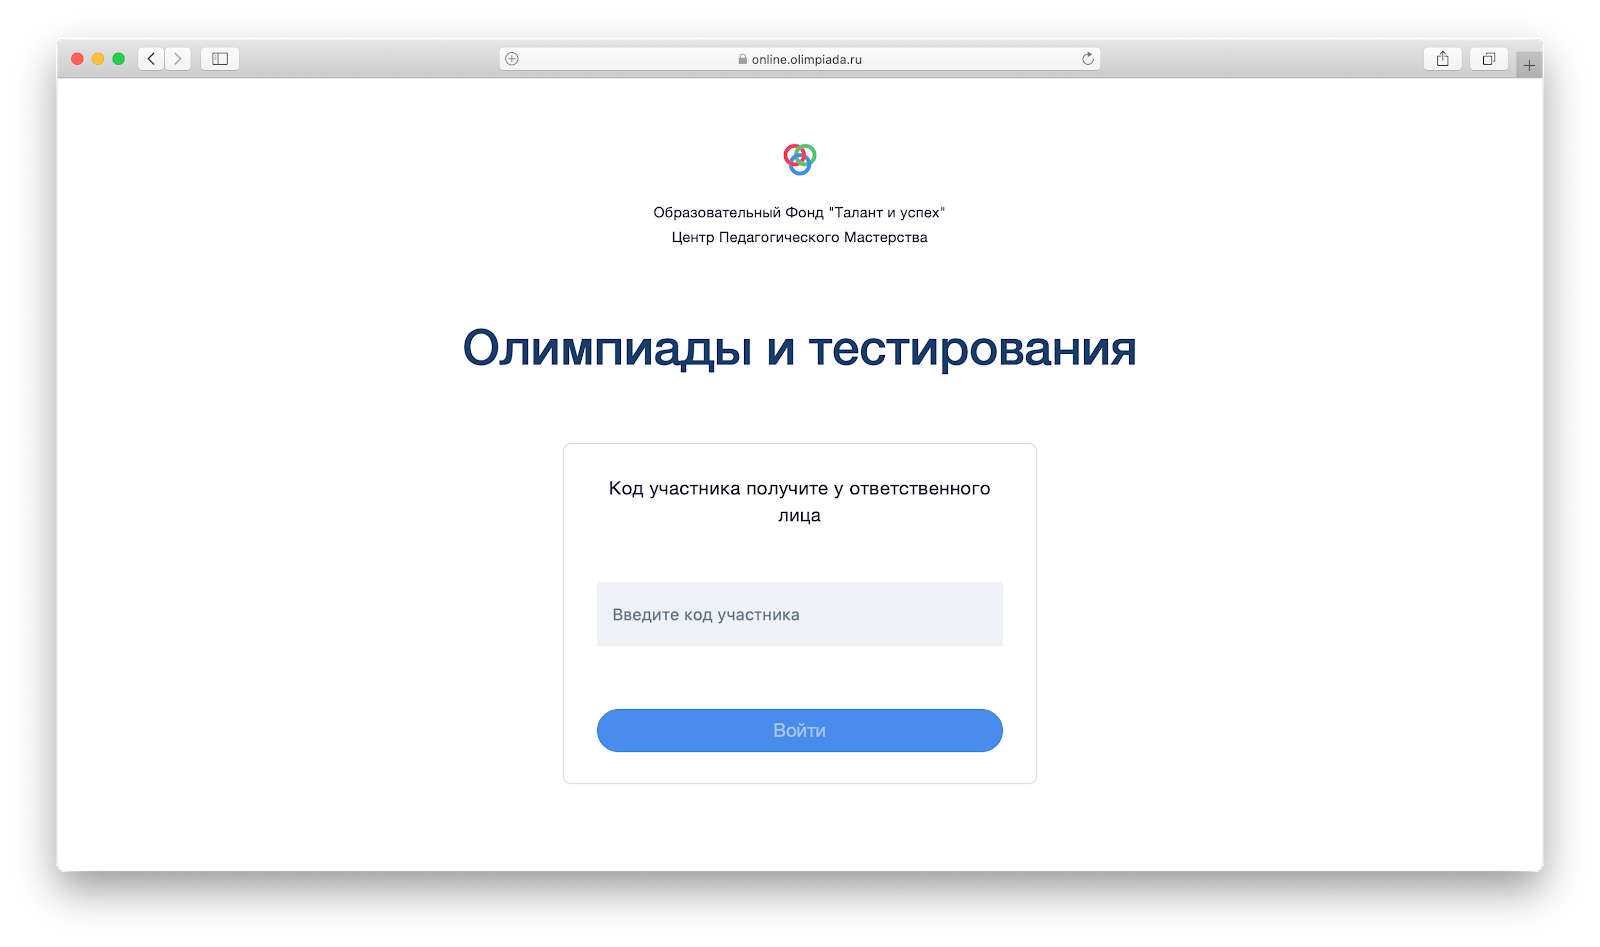 Окно регистрации на онлайн-этап олимпиад